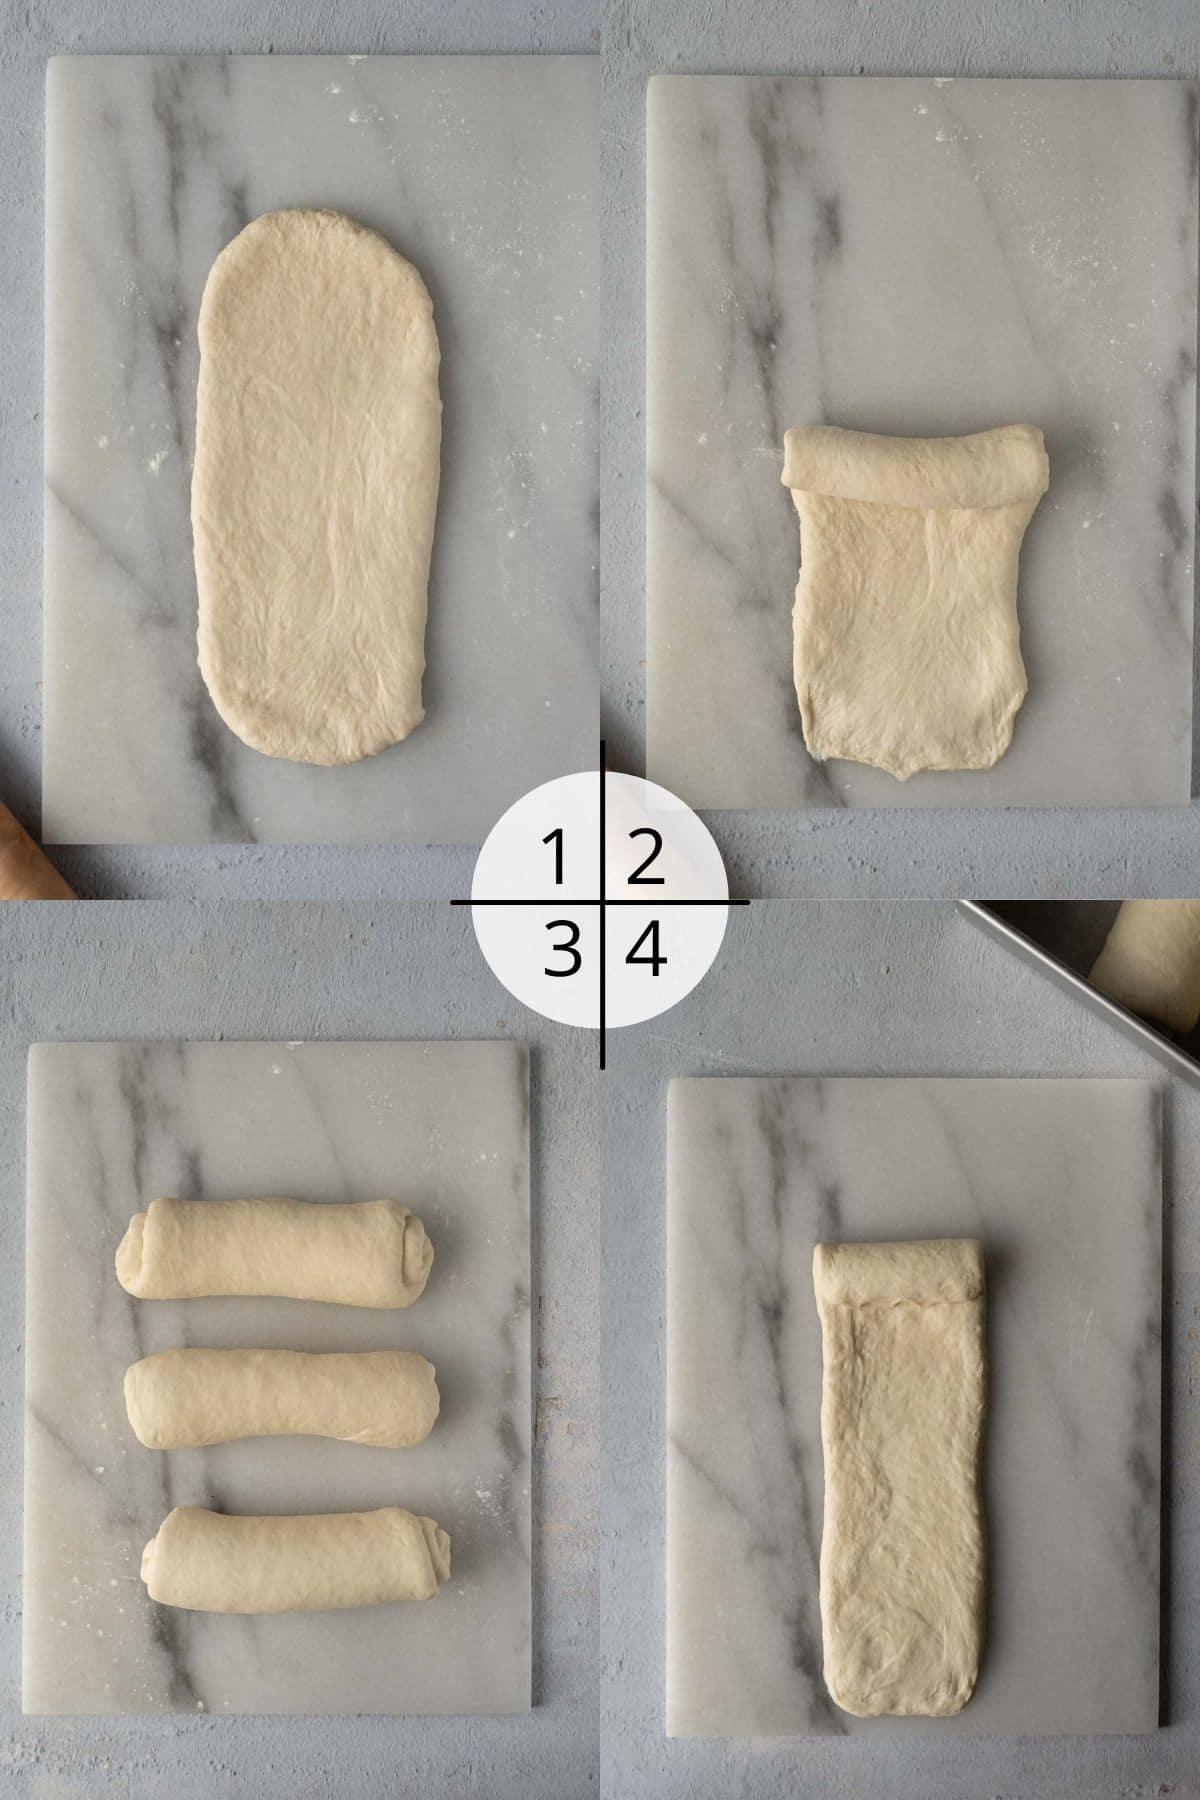 How to shape milk bread dough.